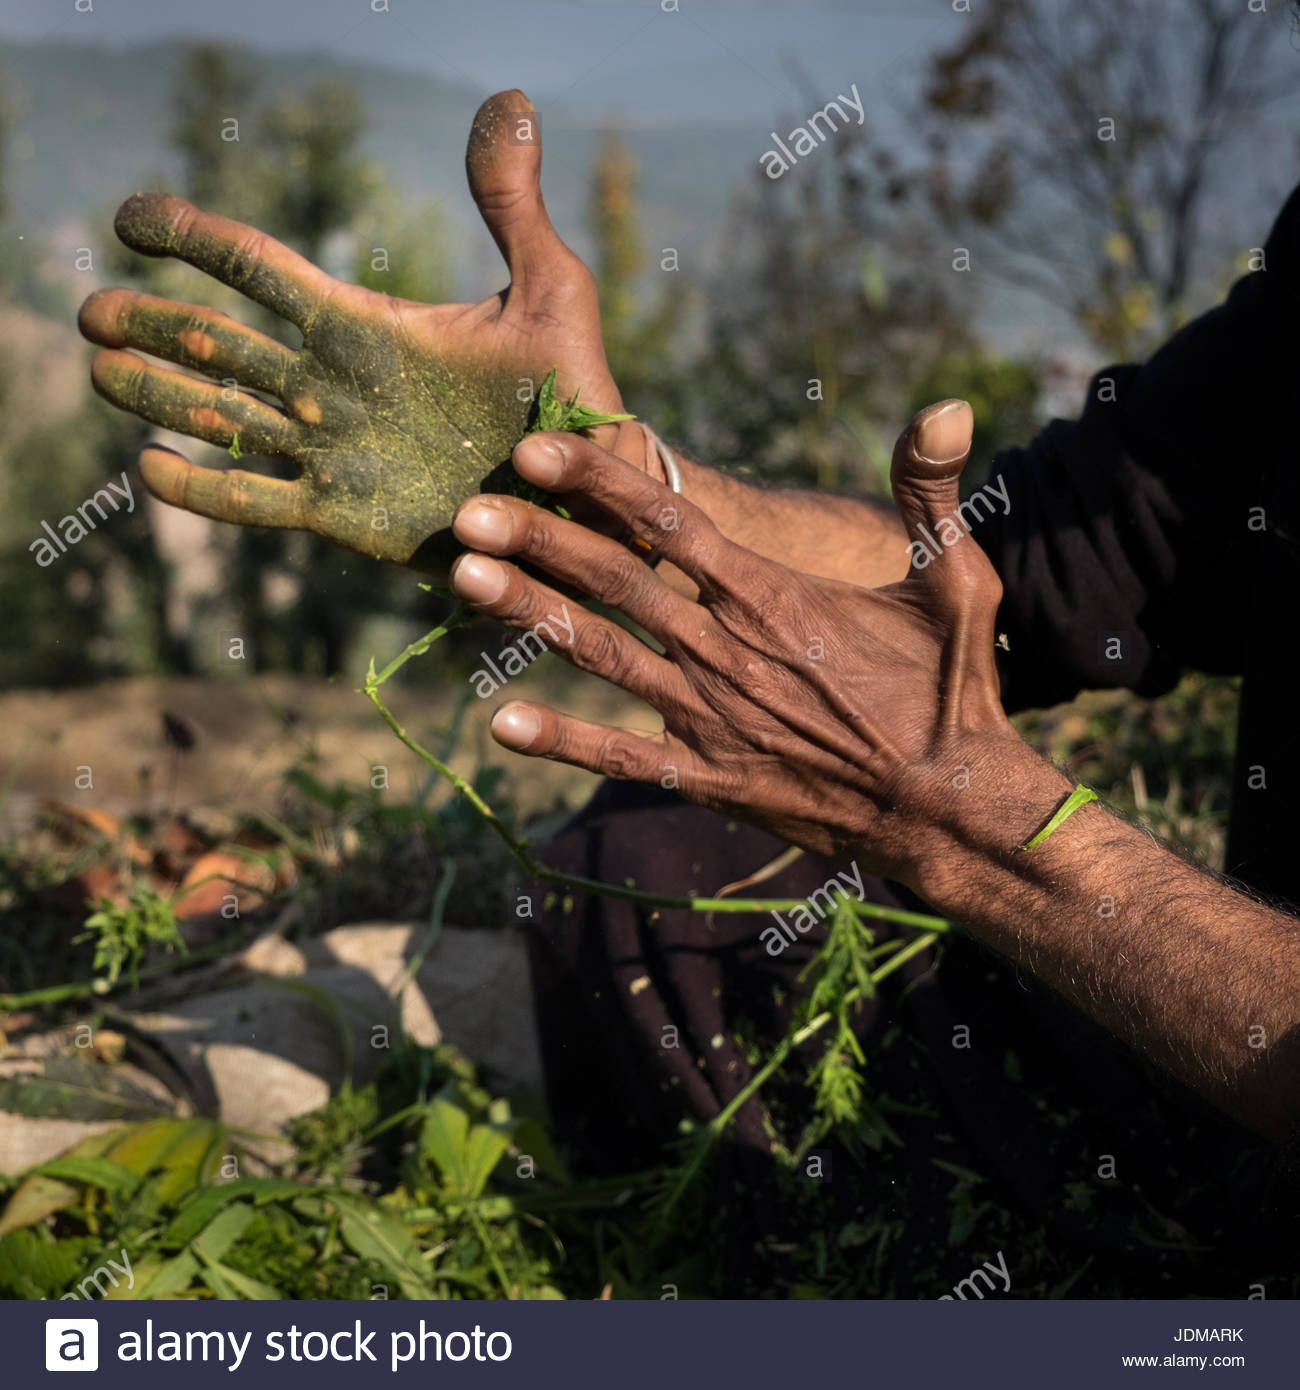 A Sadhu making hashish with marijuana. - Stock Image